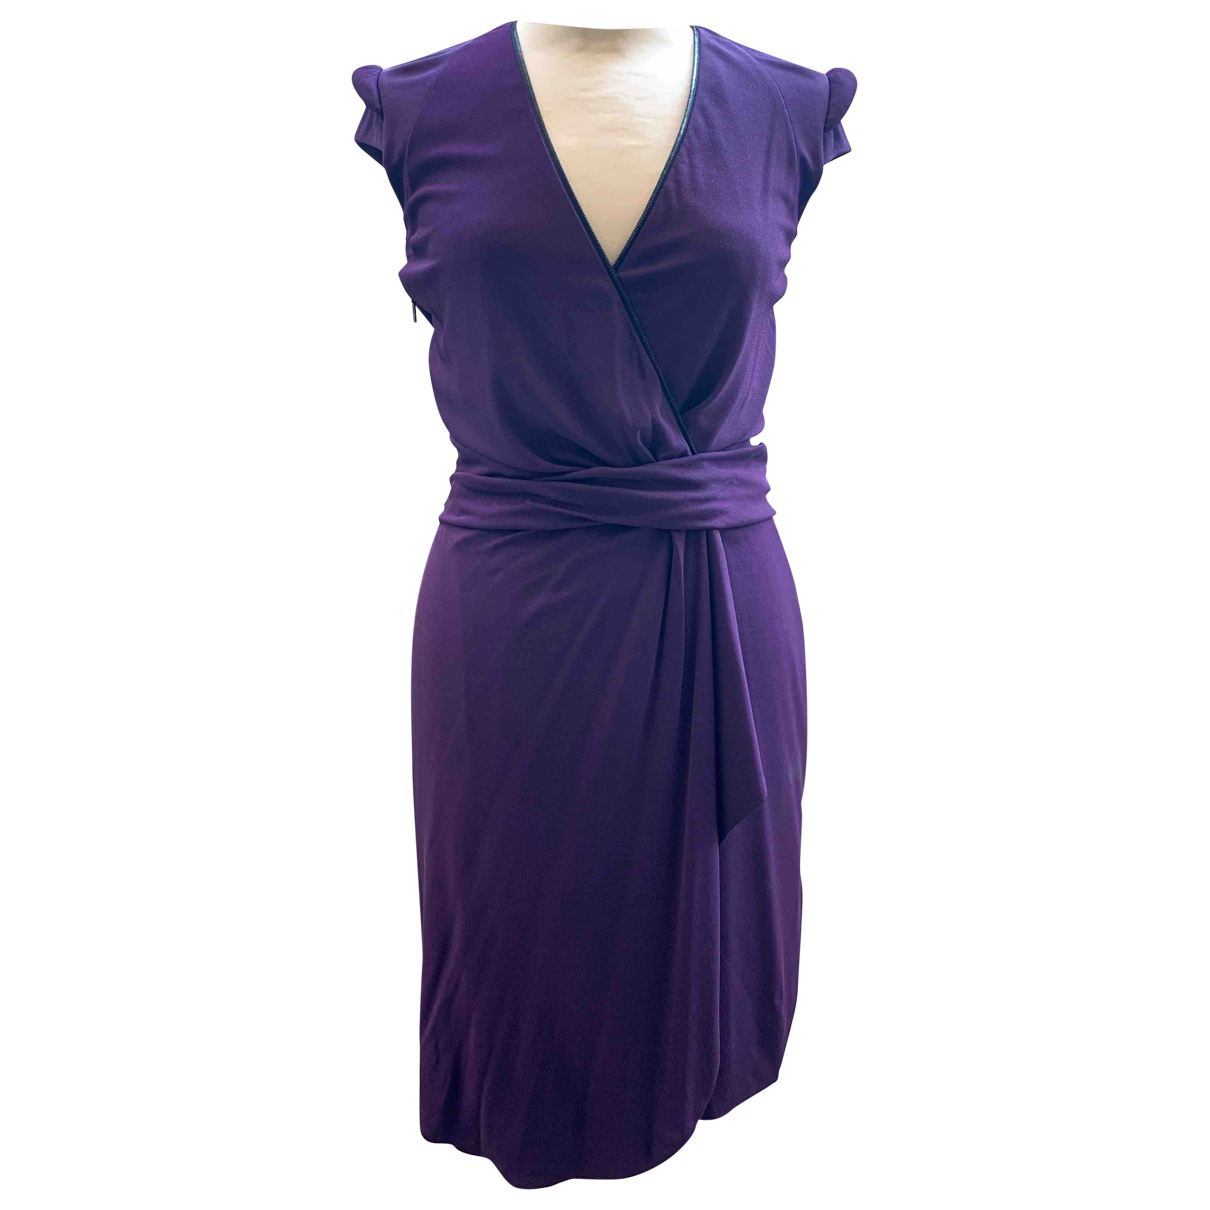 Gucci \N Purple dress for Women S International